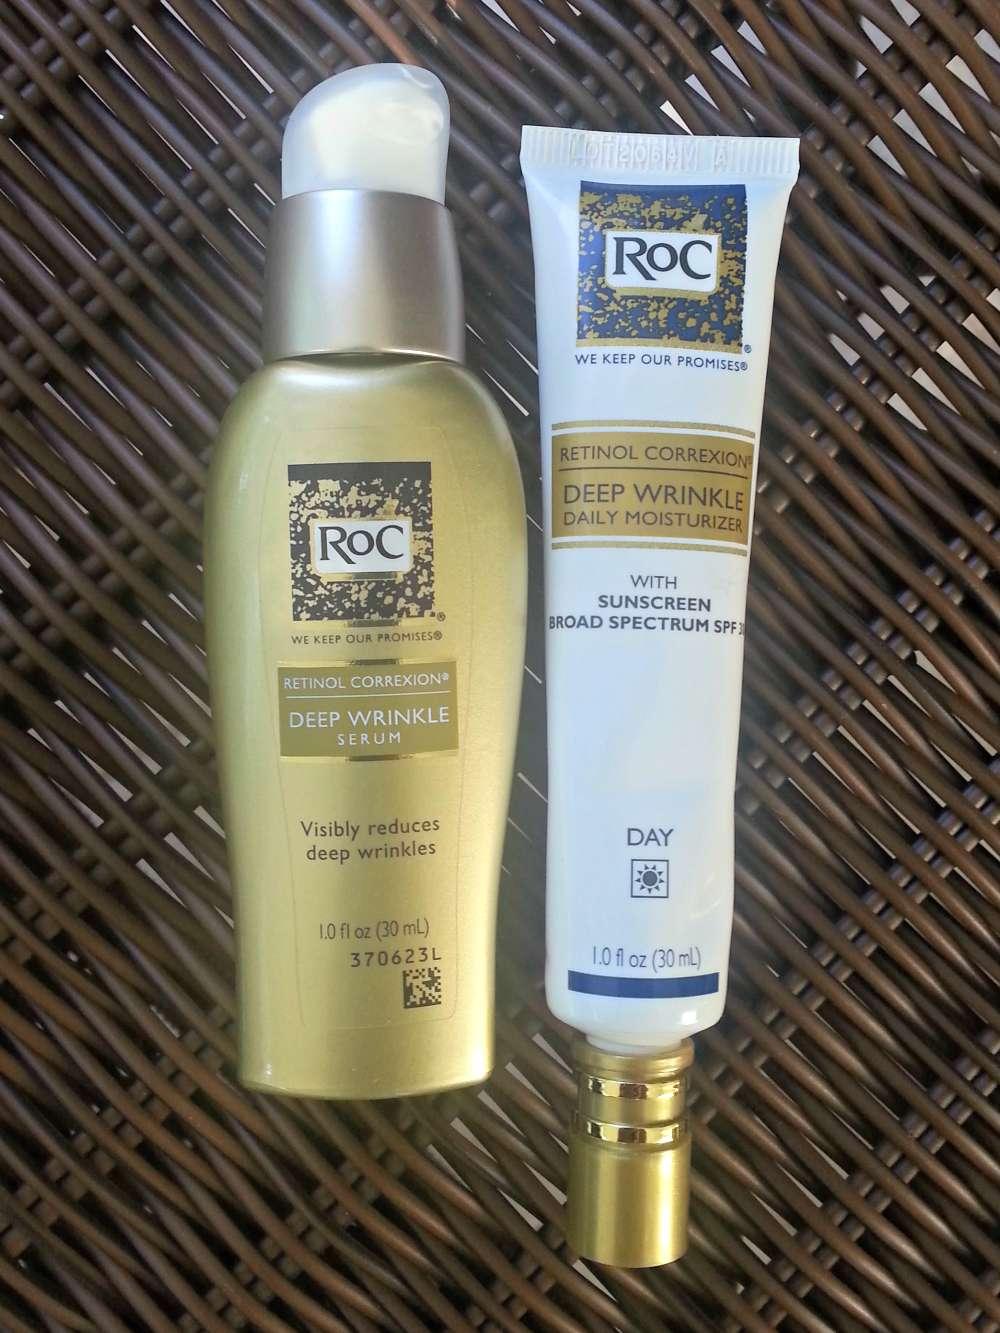 Retinol Correxion Deep Wrinkle Serum and Daily Moisturizer #RocWrinkleRanking #IC